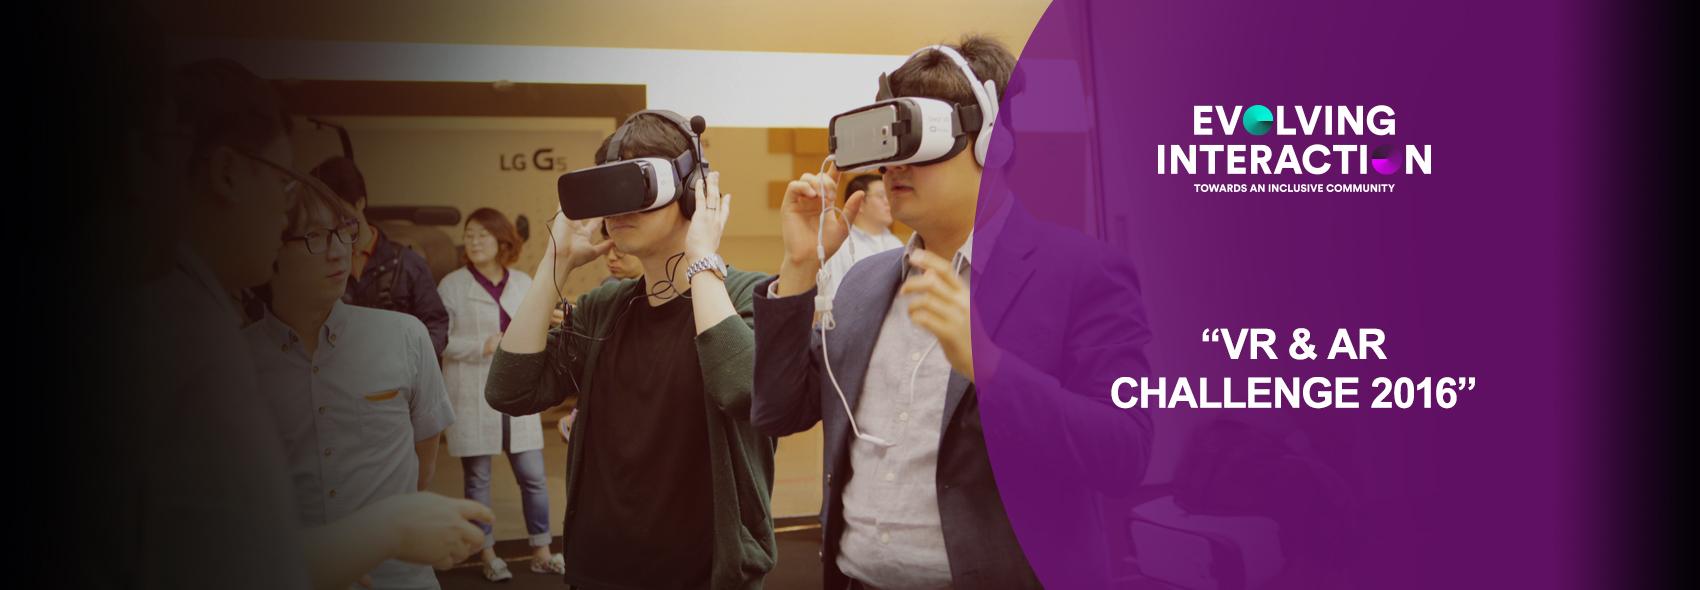 VR & AR 챌린지 2016  VR & AR 챌린지